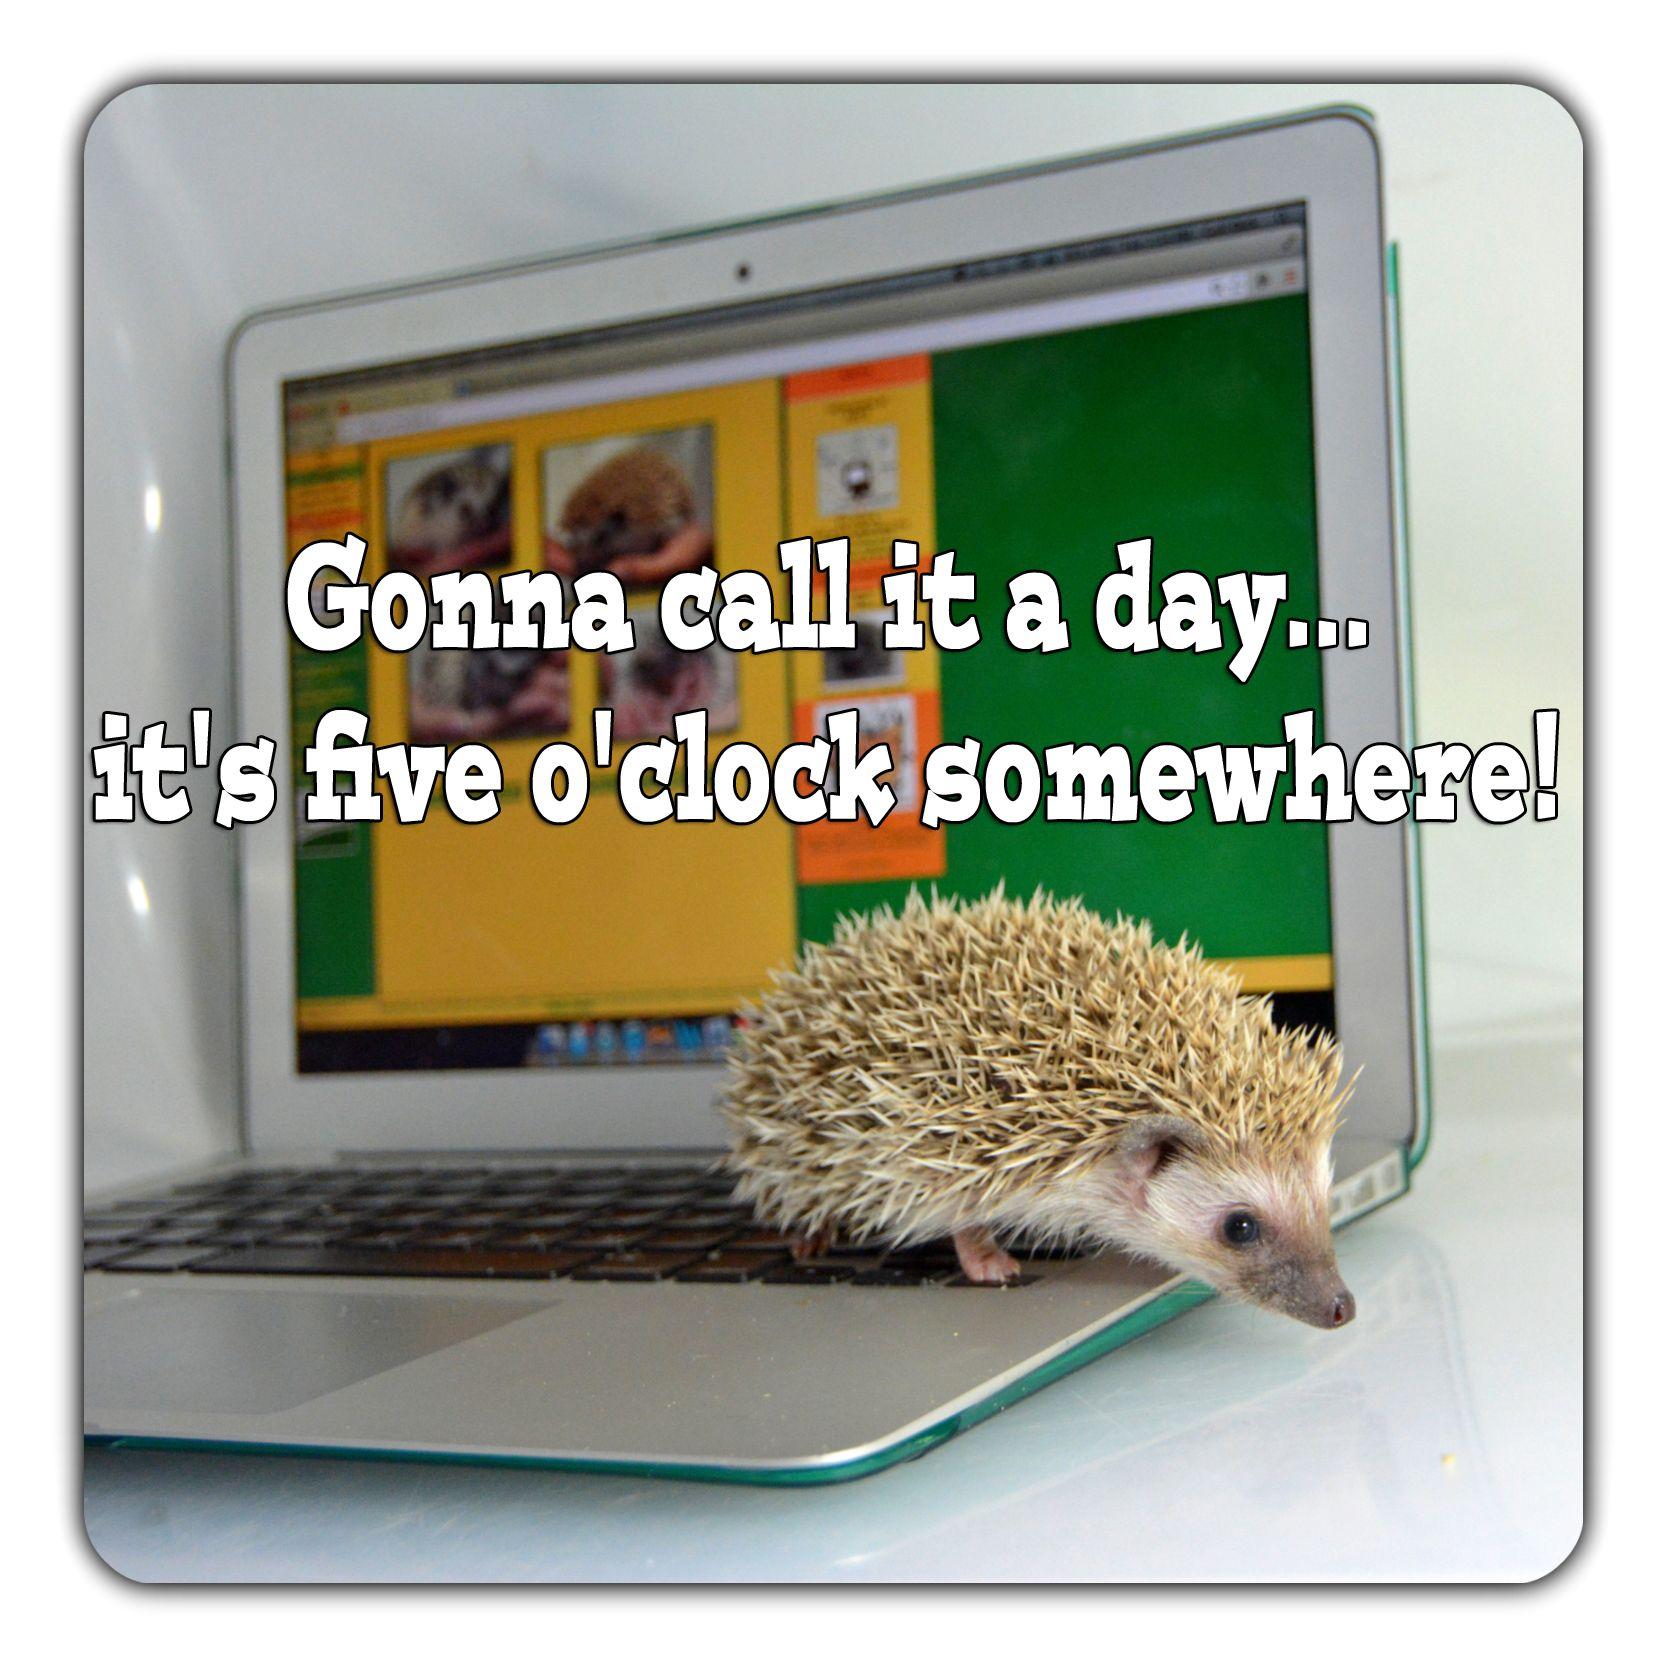 #Hedgehog #Meme #Fiveoclock #Lol #Computer #Millermeade #Breeder #Funny